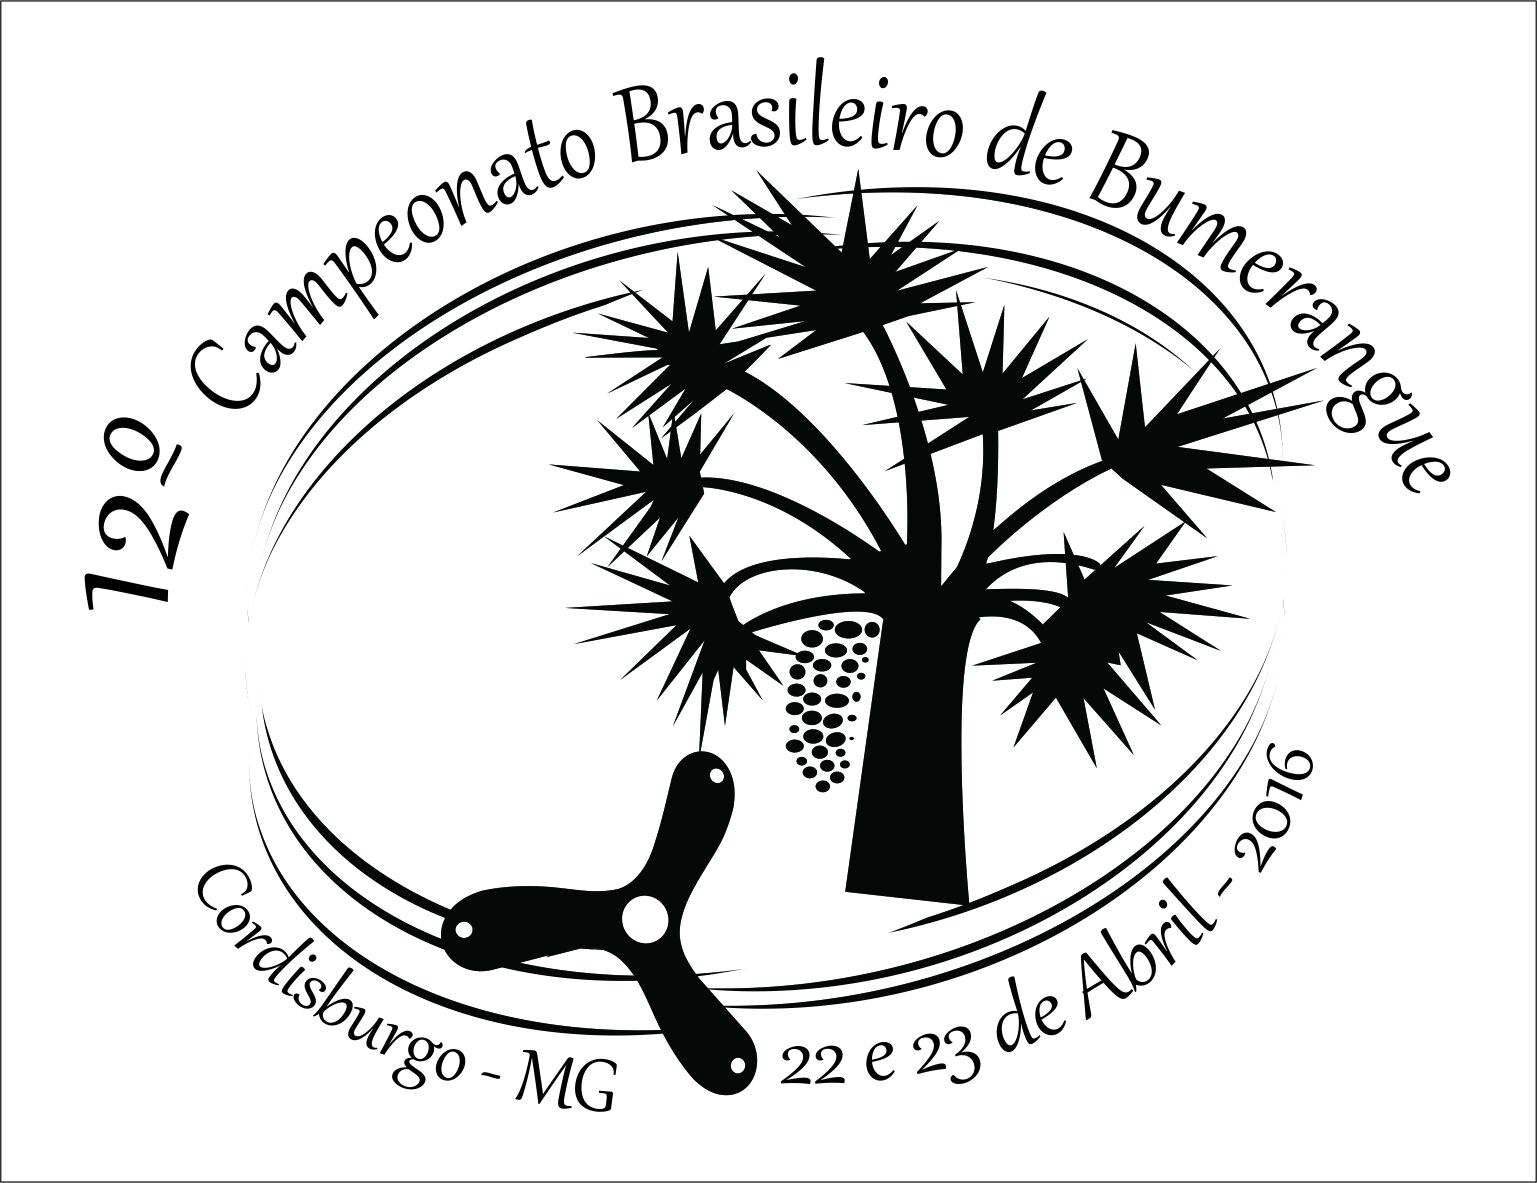 12º Campeonato Brasileiro de Bumerangue Campeonato, Cordisburgo. Minas Gerais, Bumerangue, Associação Brasileira de Bumerangue, ABB